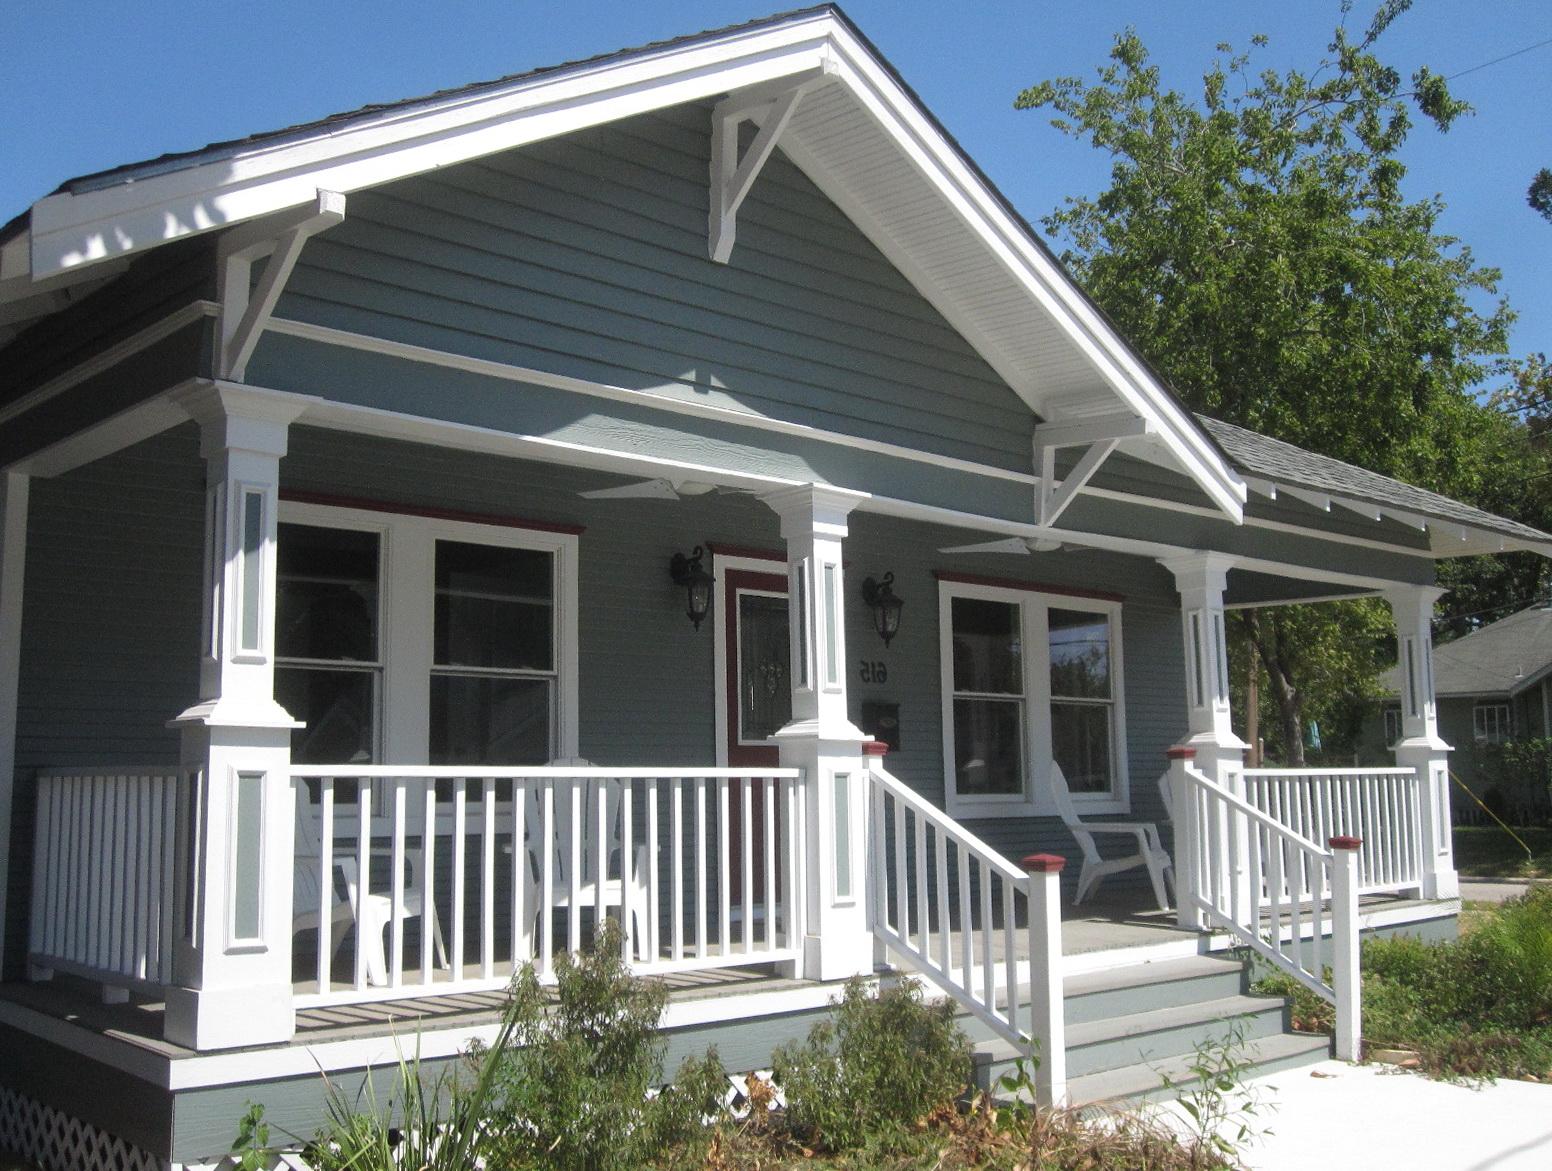 Adding A Front Porch To A Bungalow Home Design Ideas